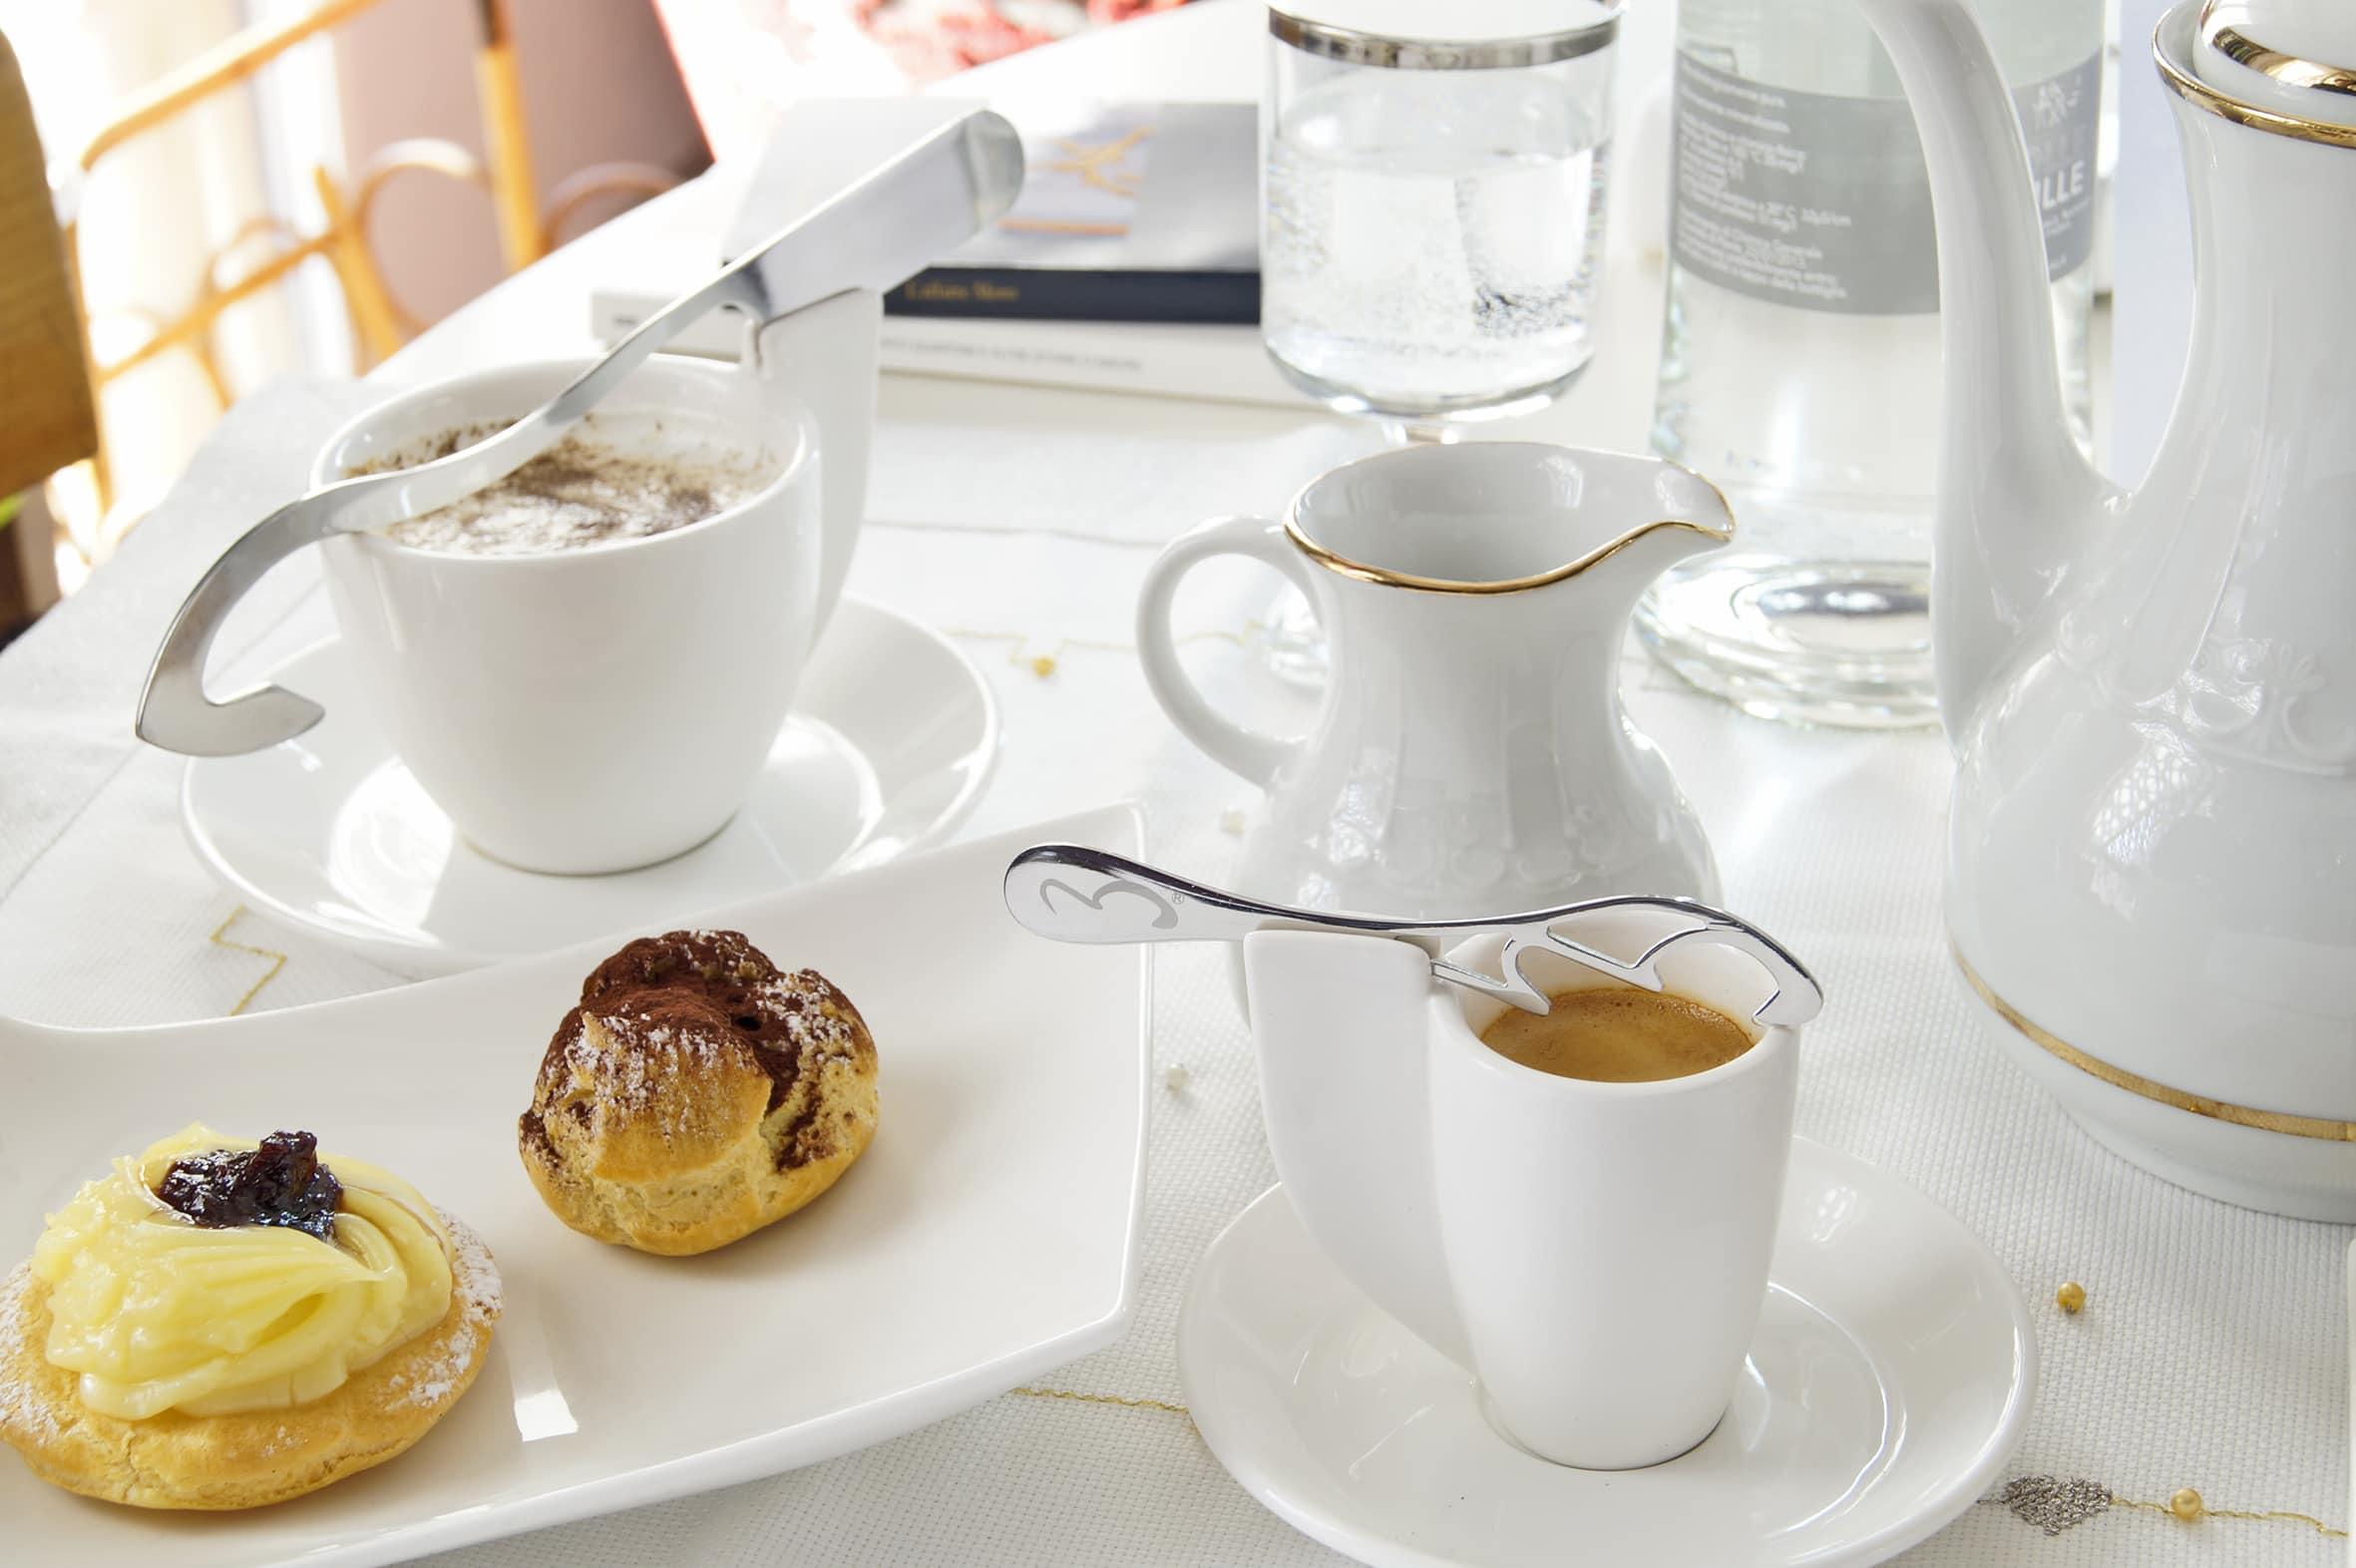 post 26 - Modishspoon : Change the way of enjoying espresso